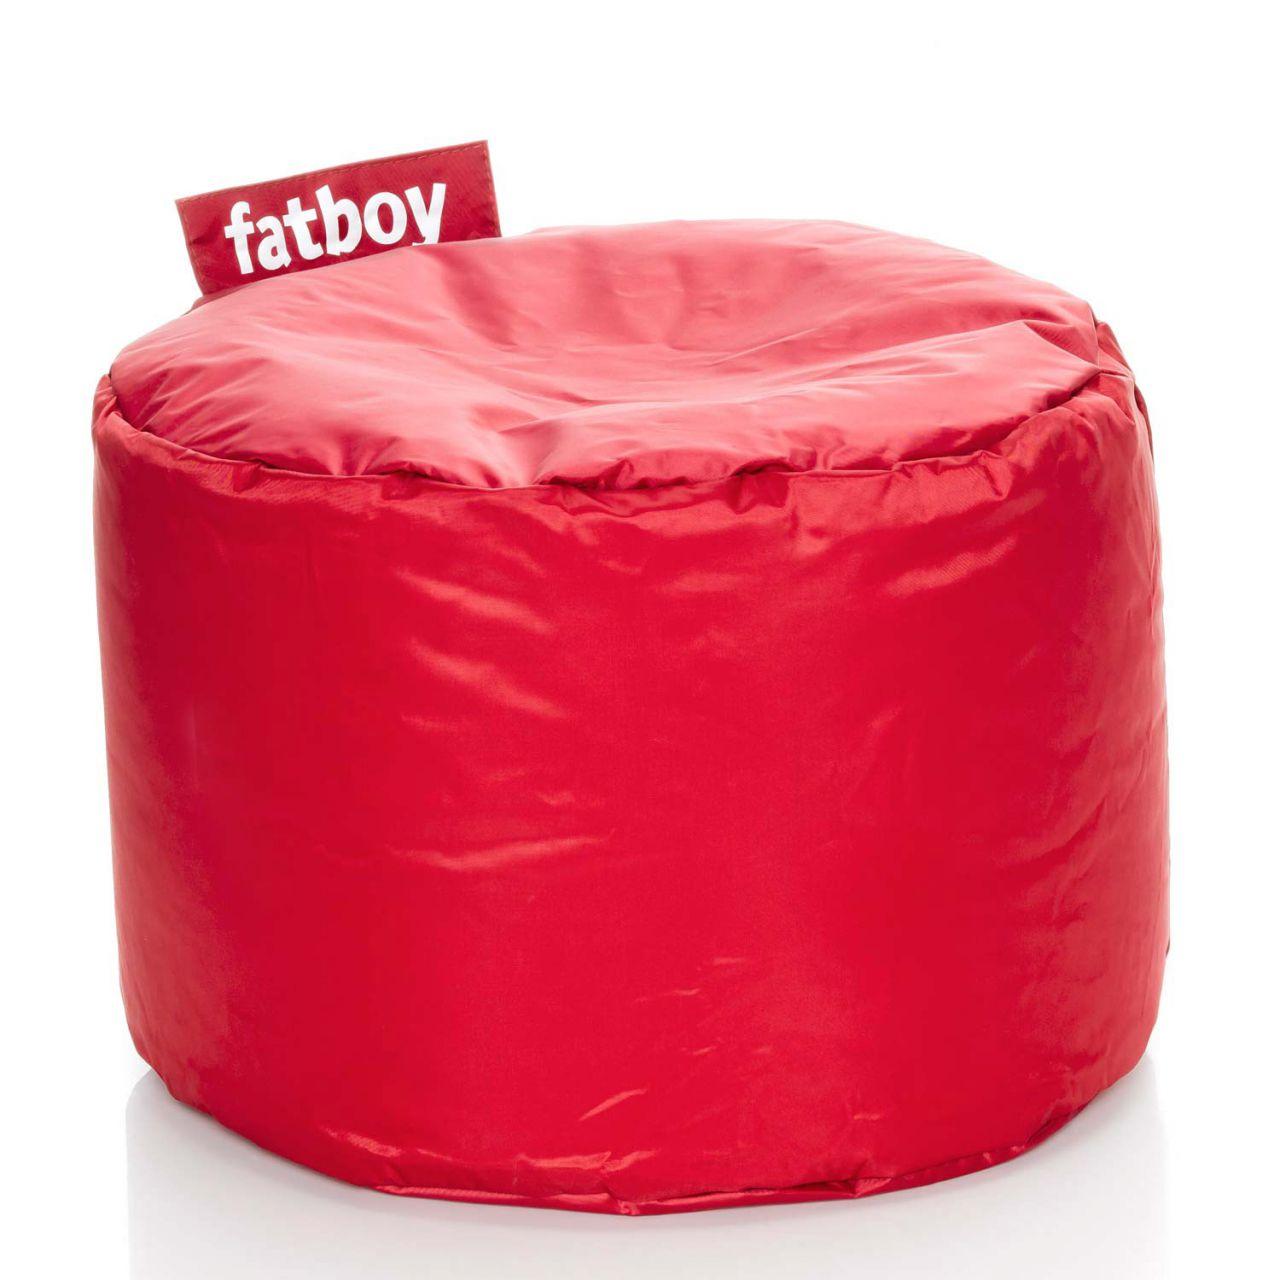 Fatboy - Point Sitzhocker 900.0032